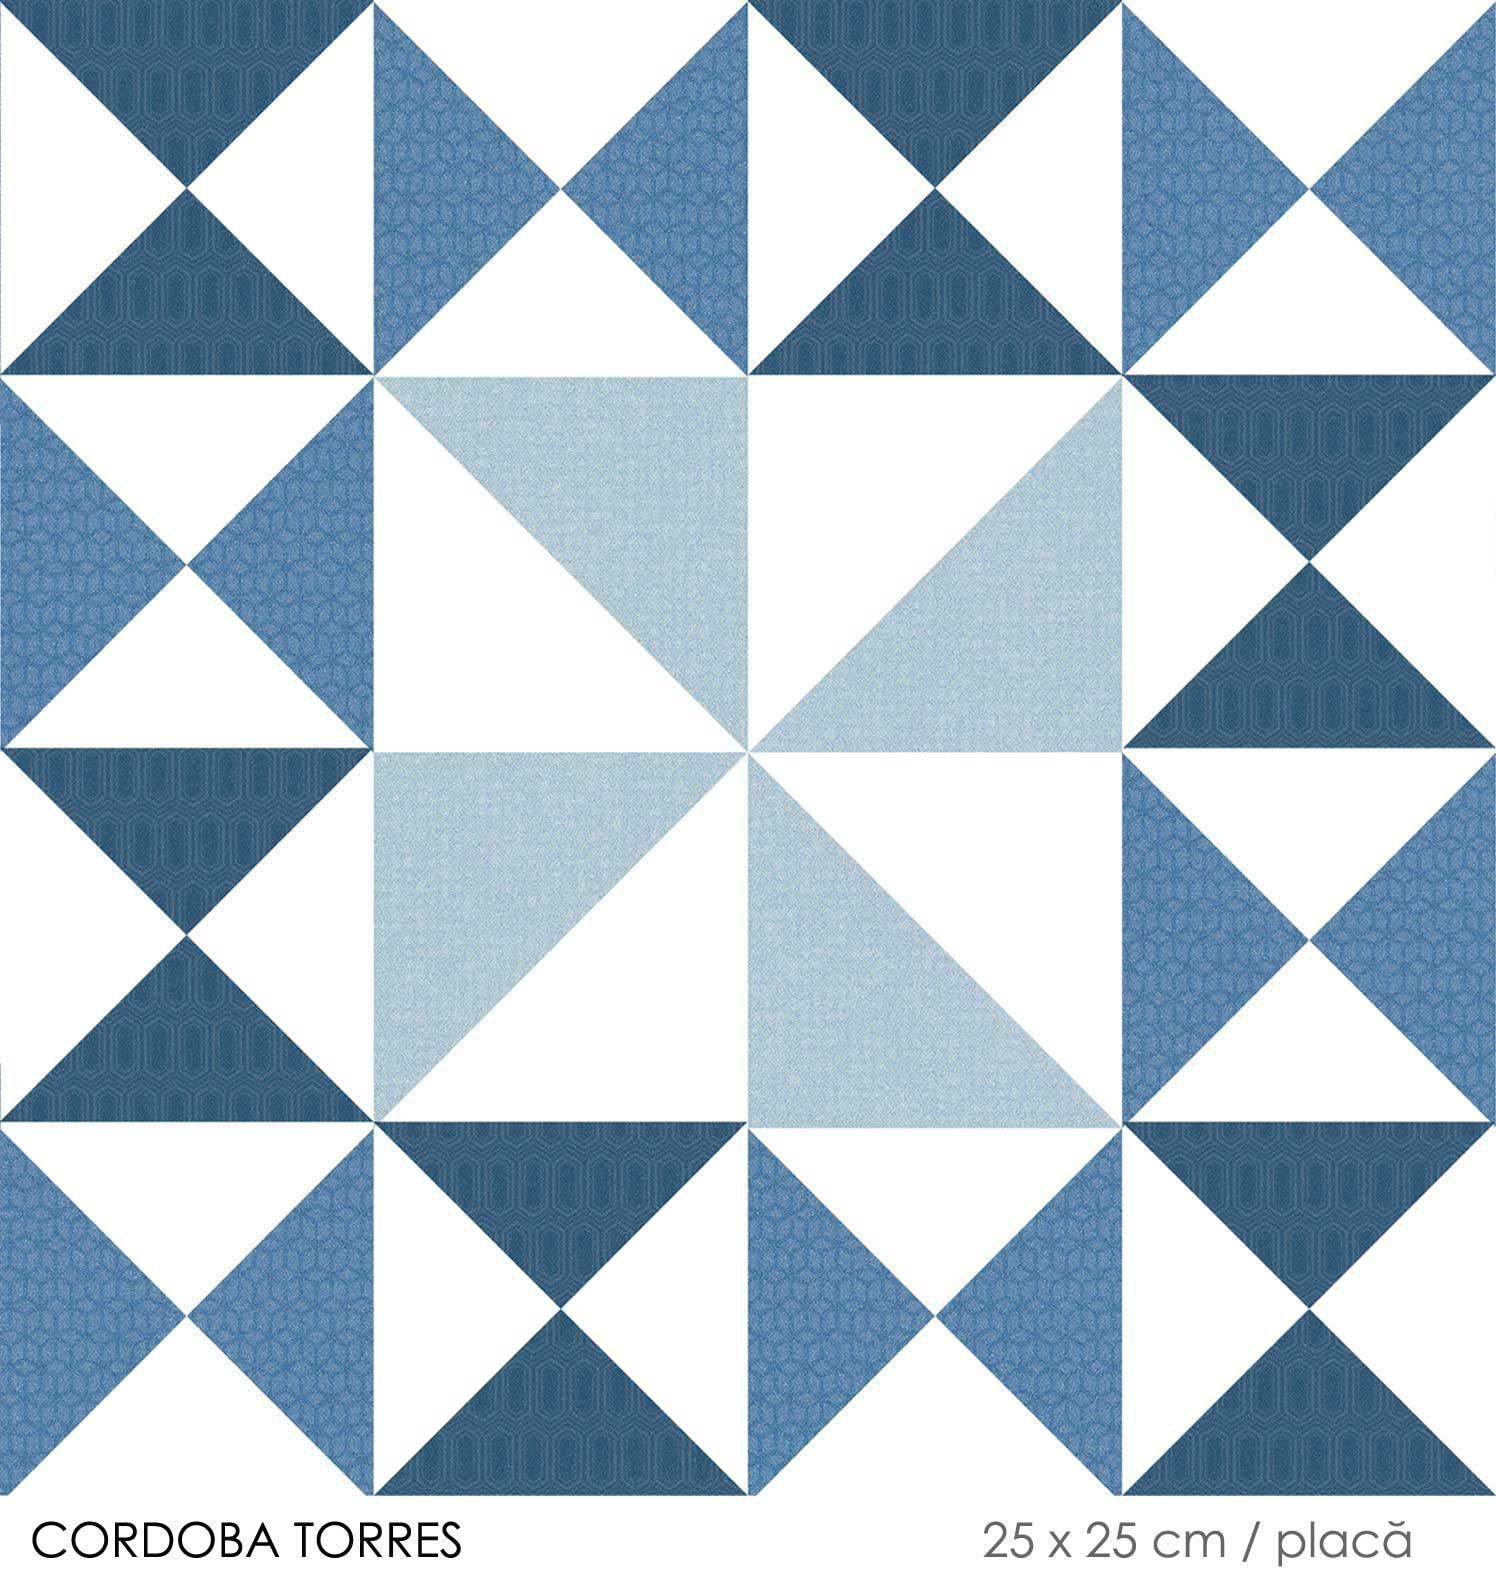 Gresie albastra 25 x 25 cm Keros